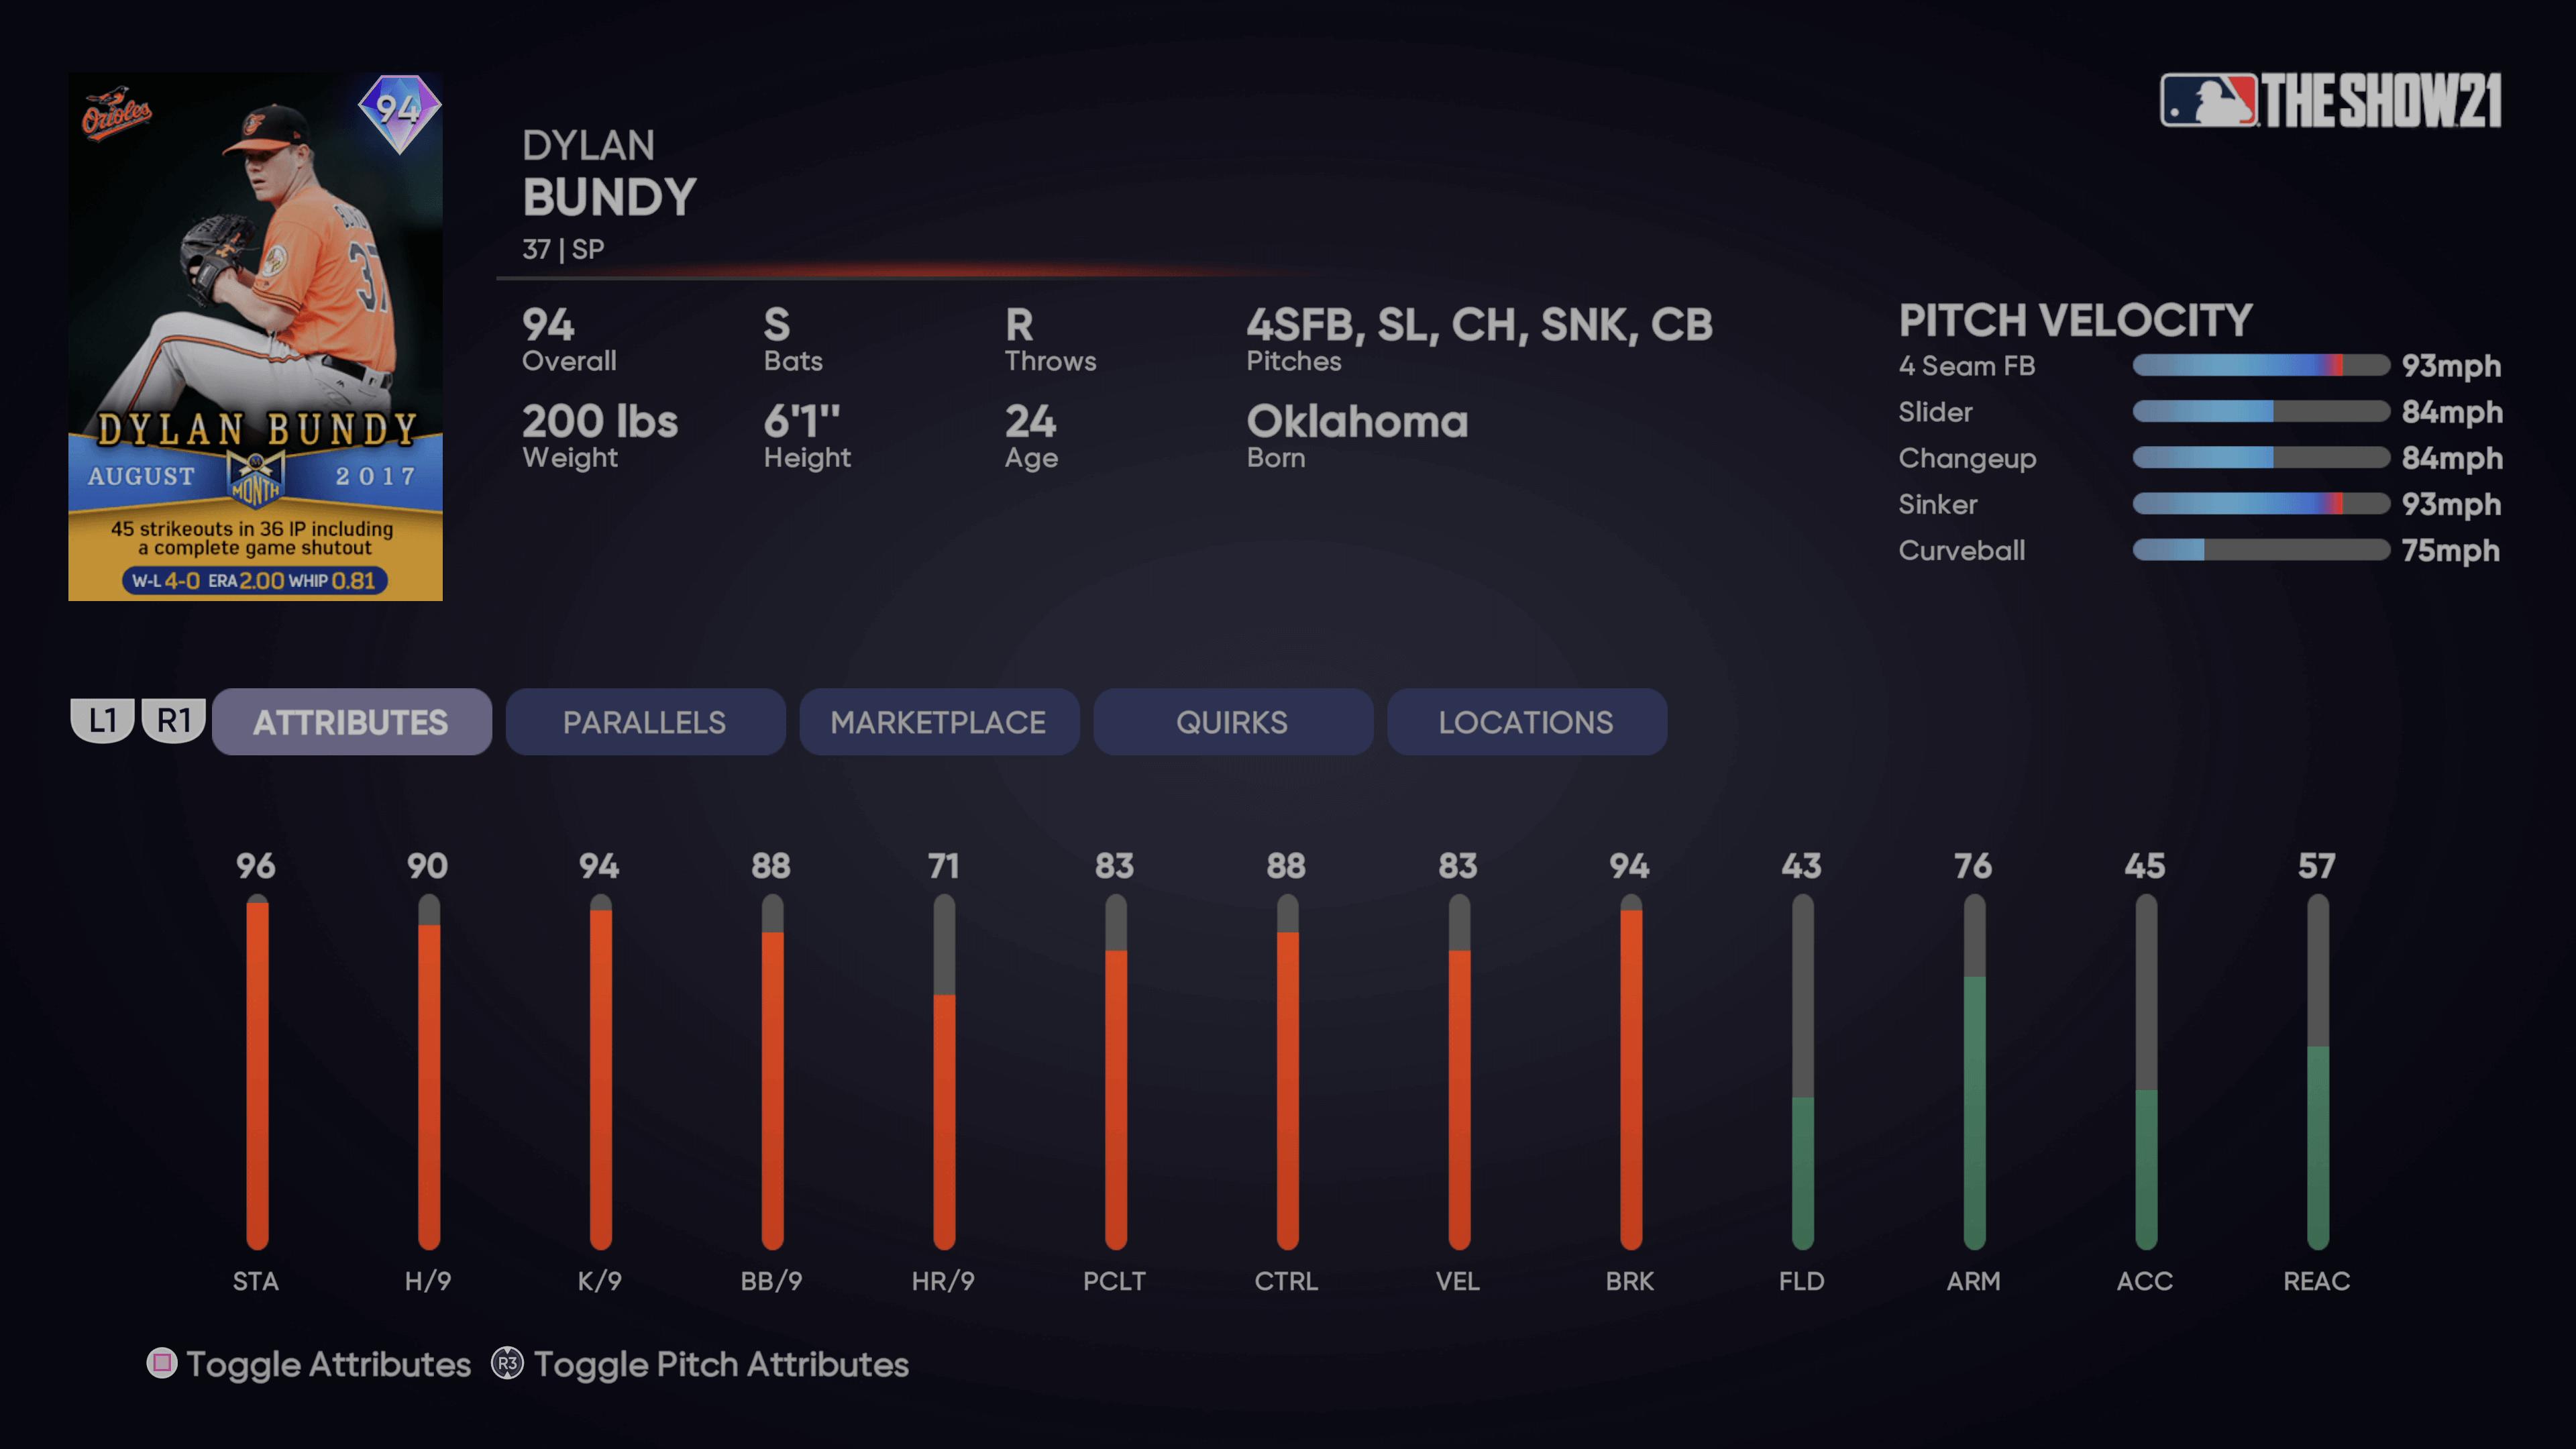 MLB The Show 21 - 7th Inning Program_2021-09-24_15-08-45